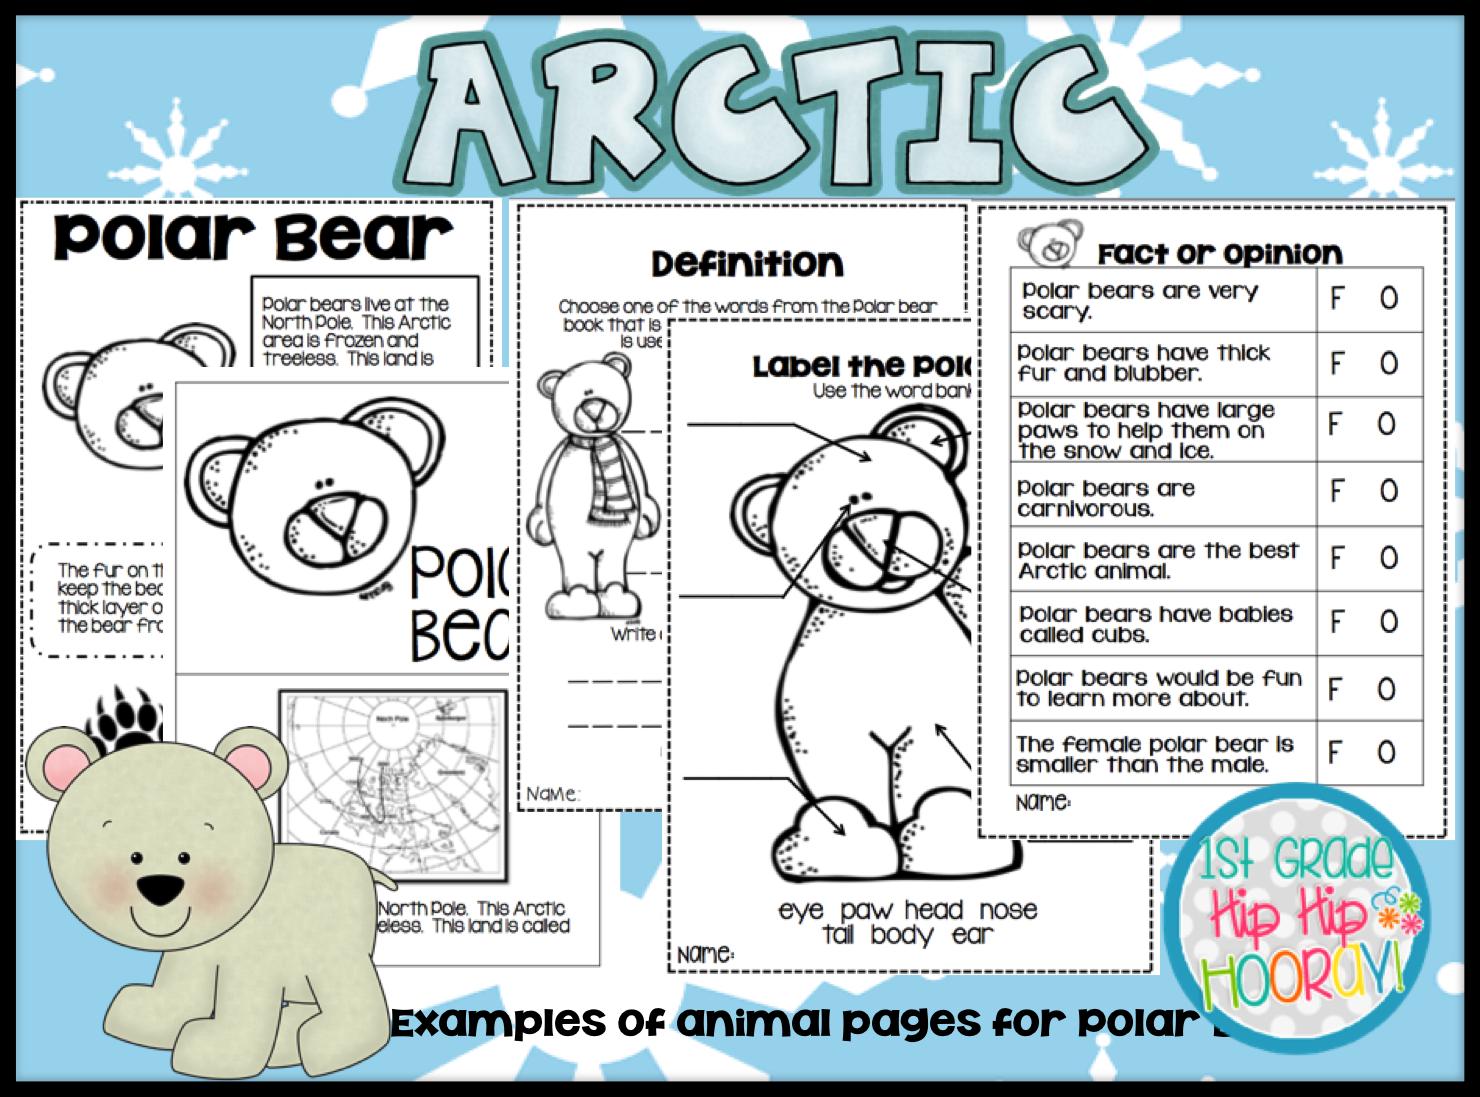 1st Grade Hip Hip Hooray Arctic Animals Formational